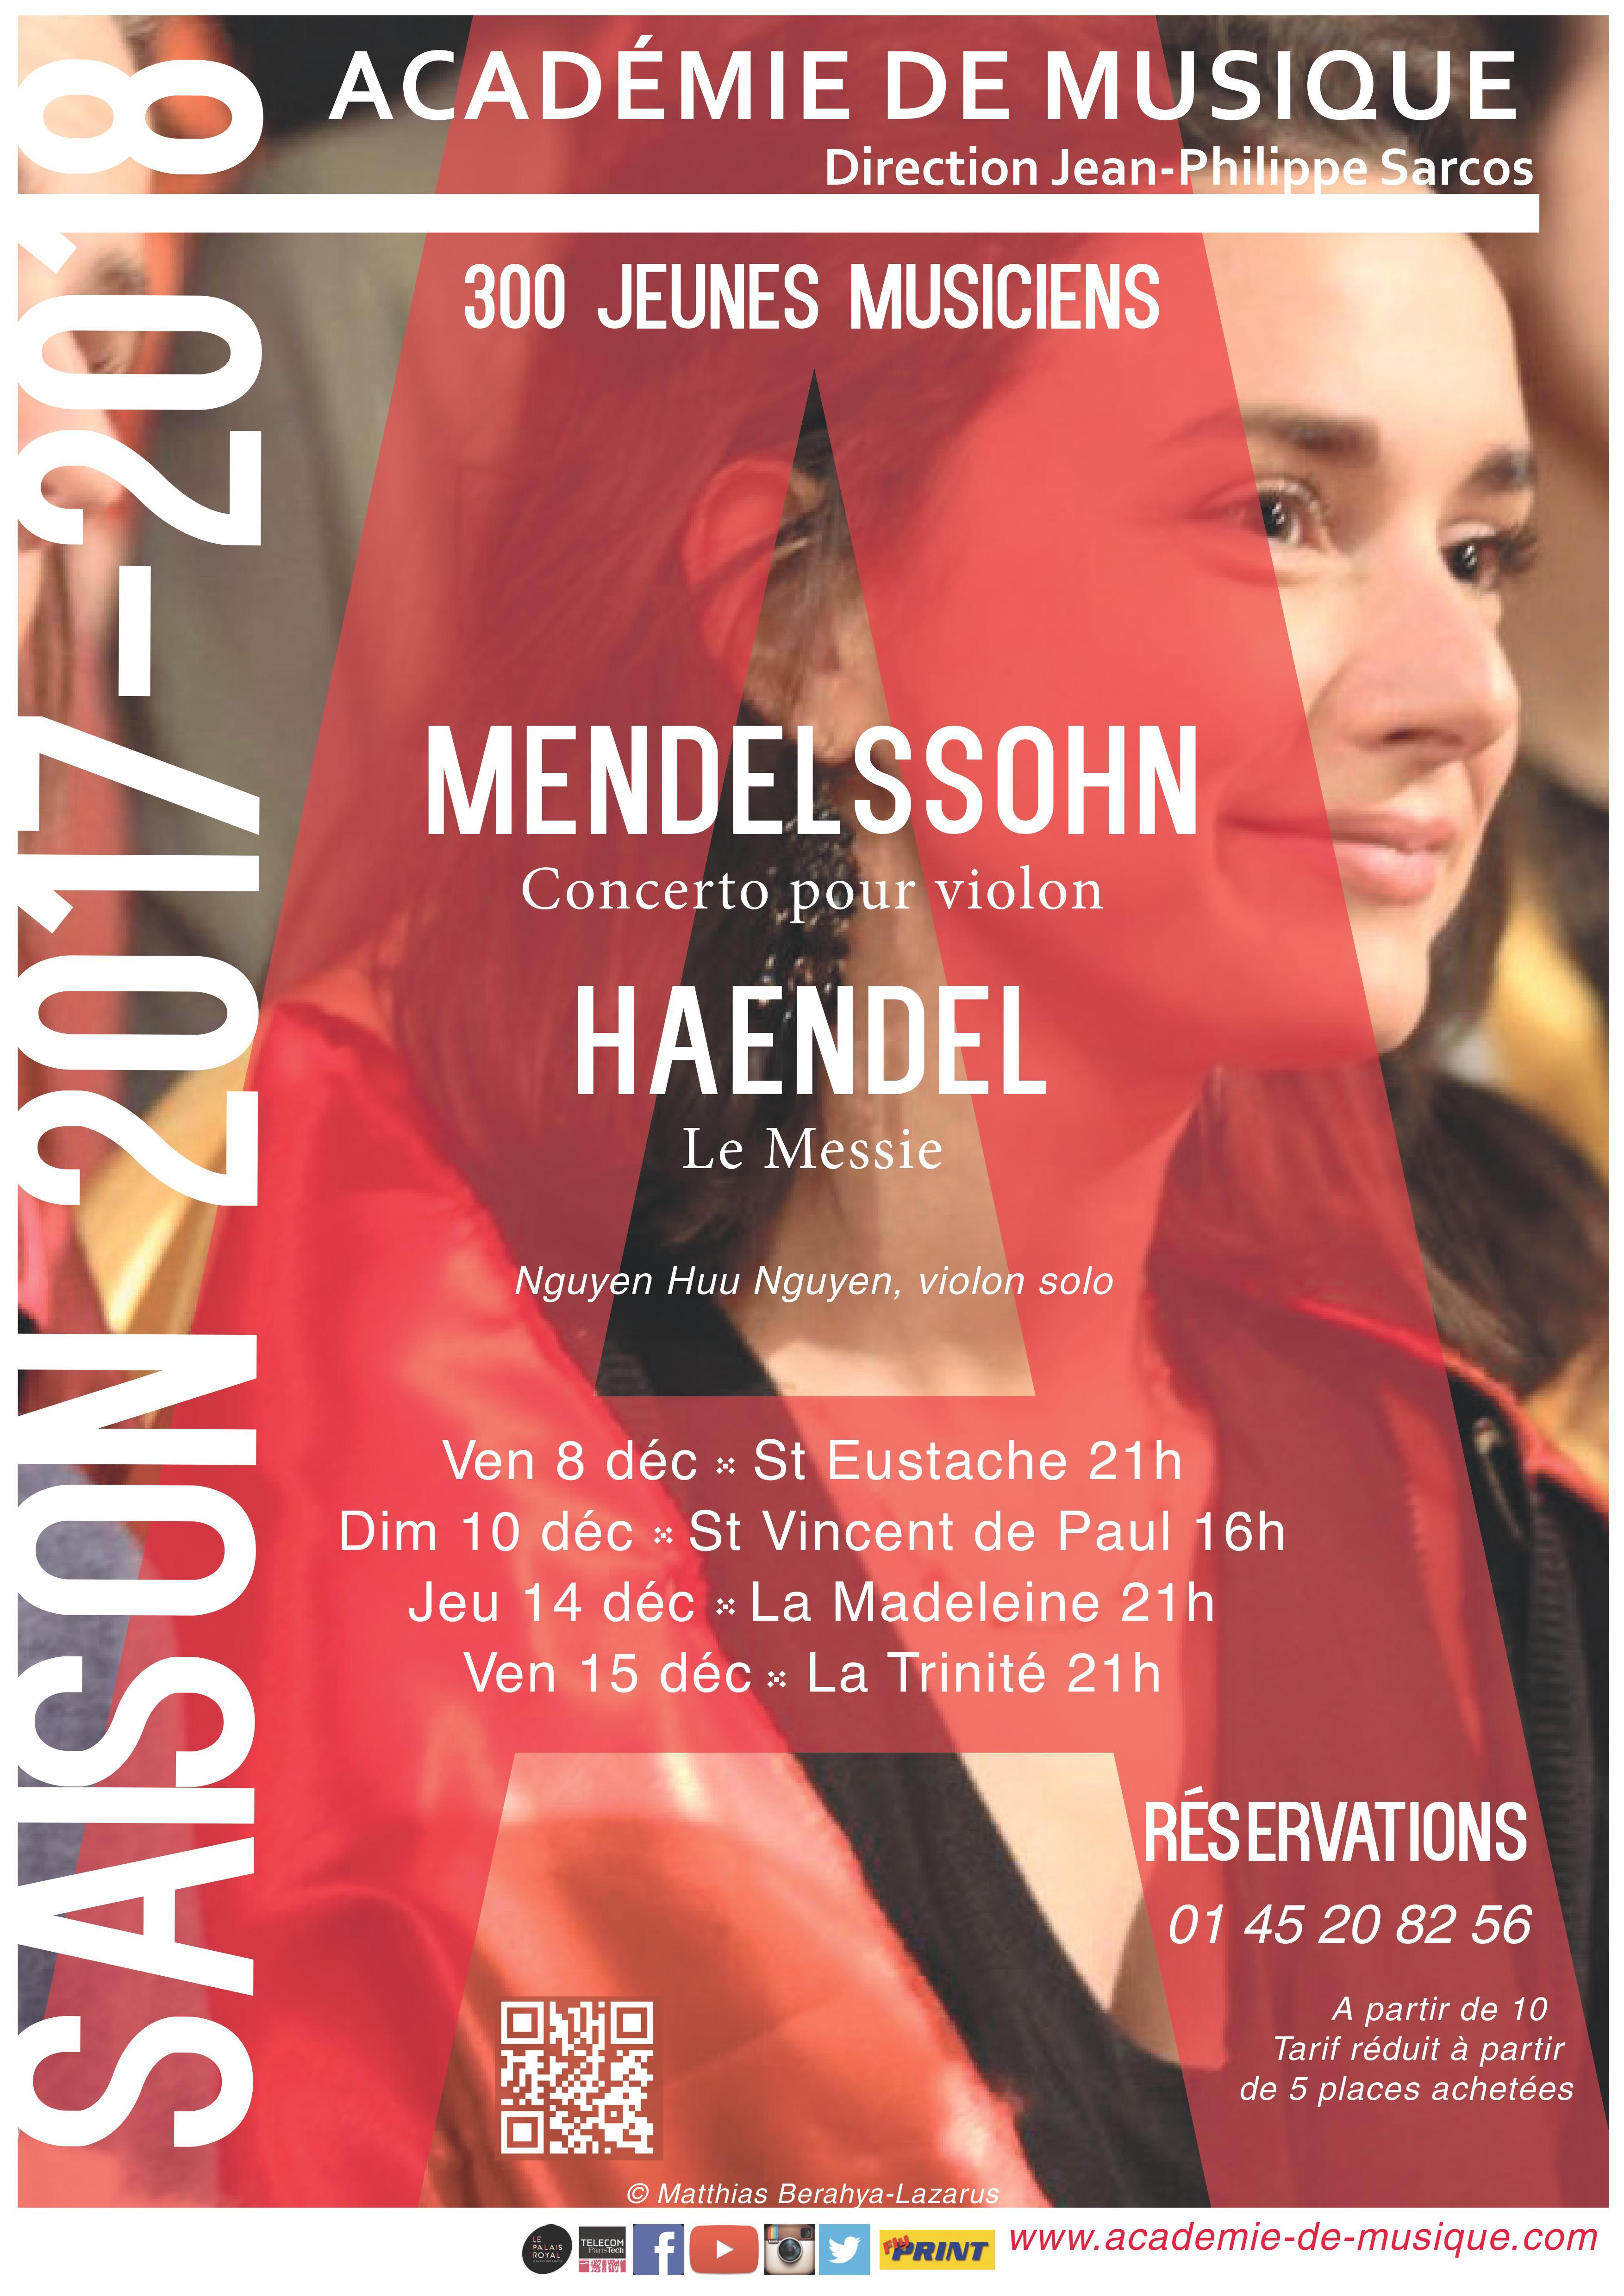 Affiche concerts Mendelssohn Haendel déc 2017